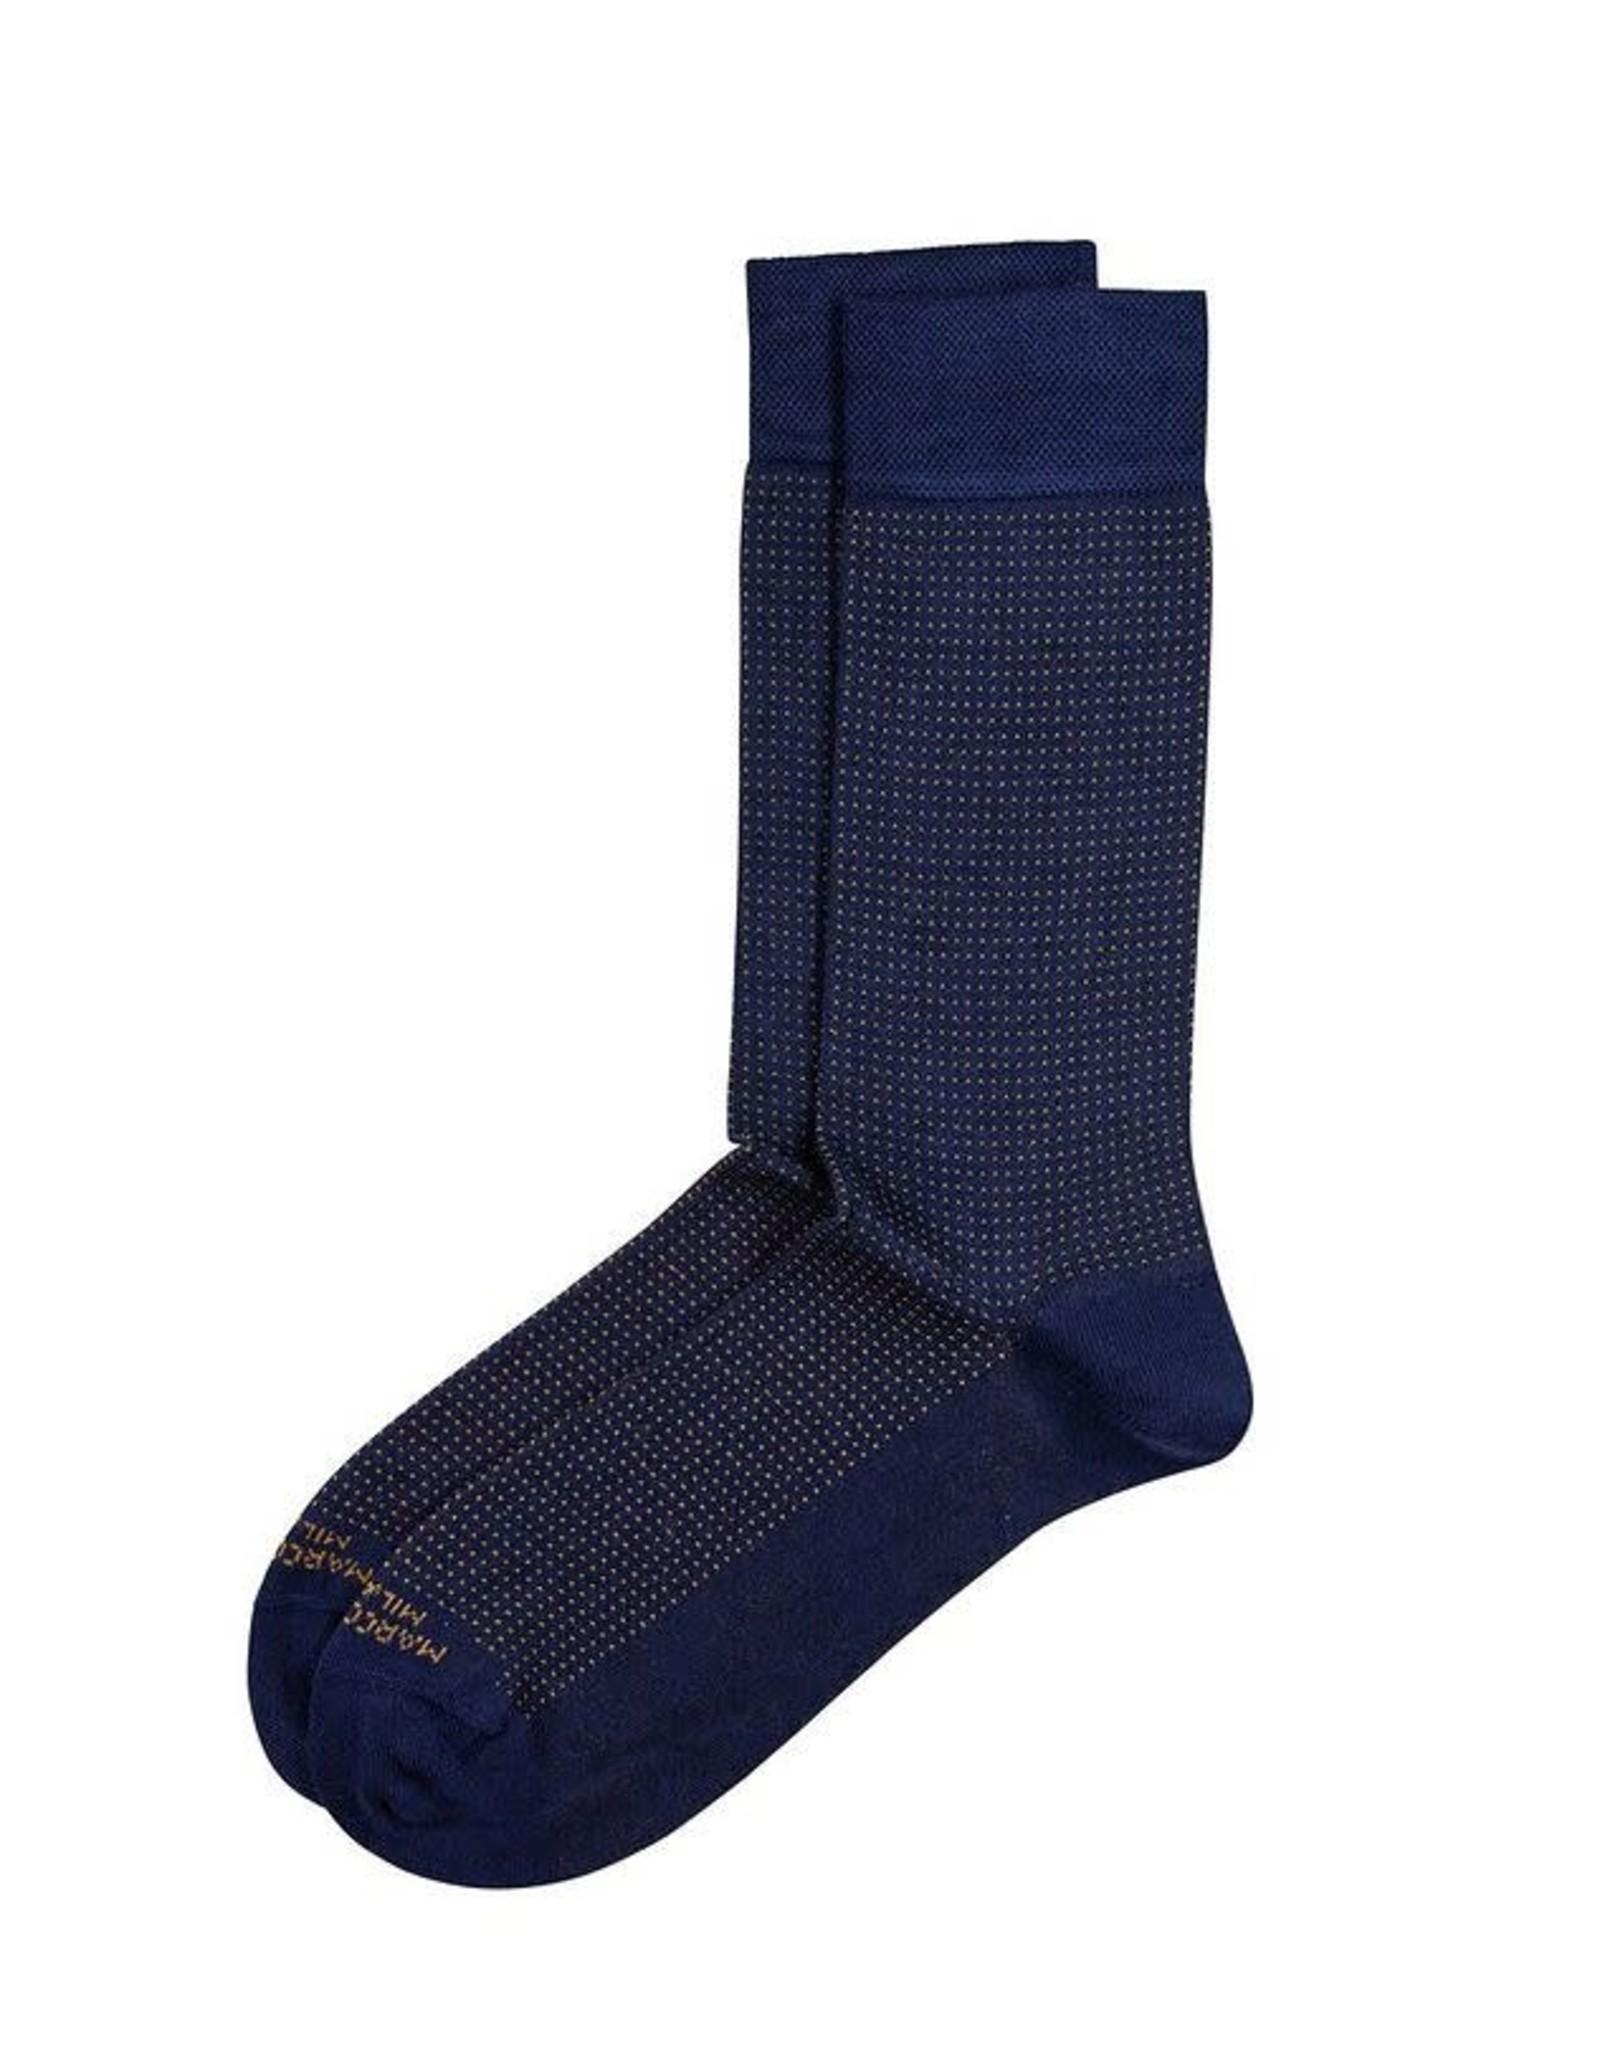 Marcoliani Marcoliani Hi-Class Socks Micro Pin Dot